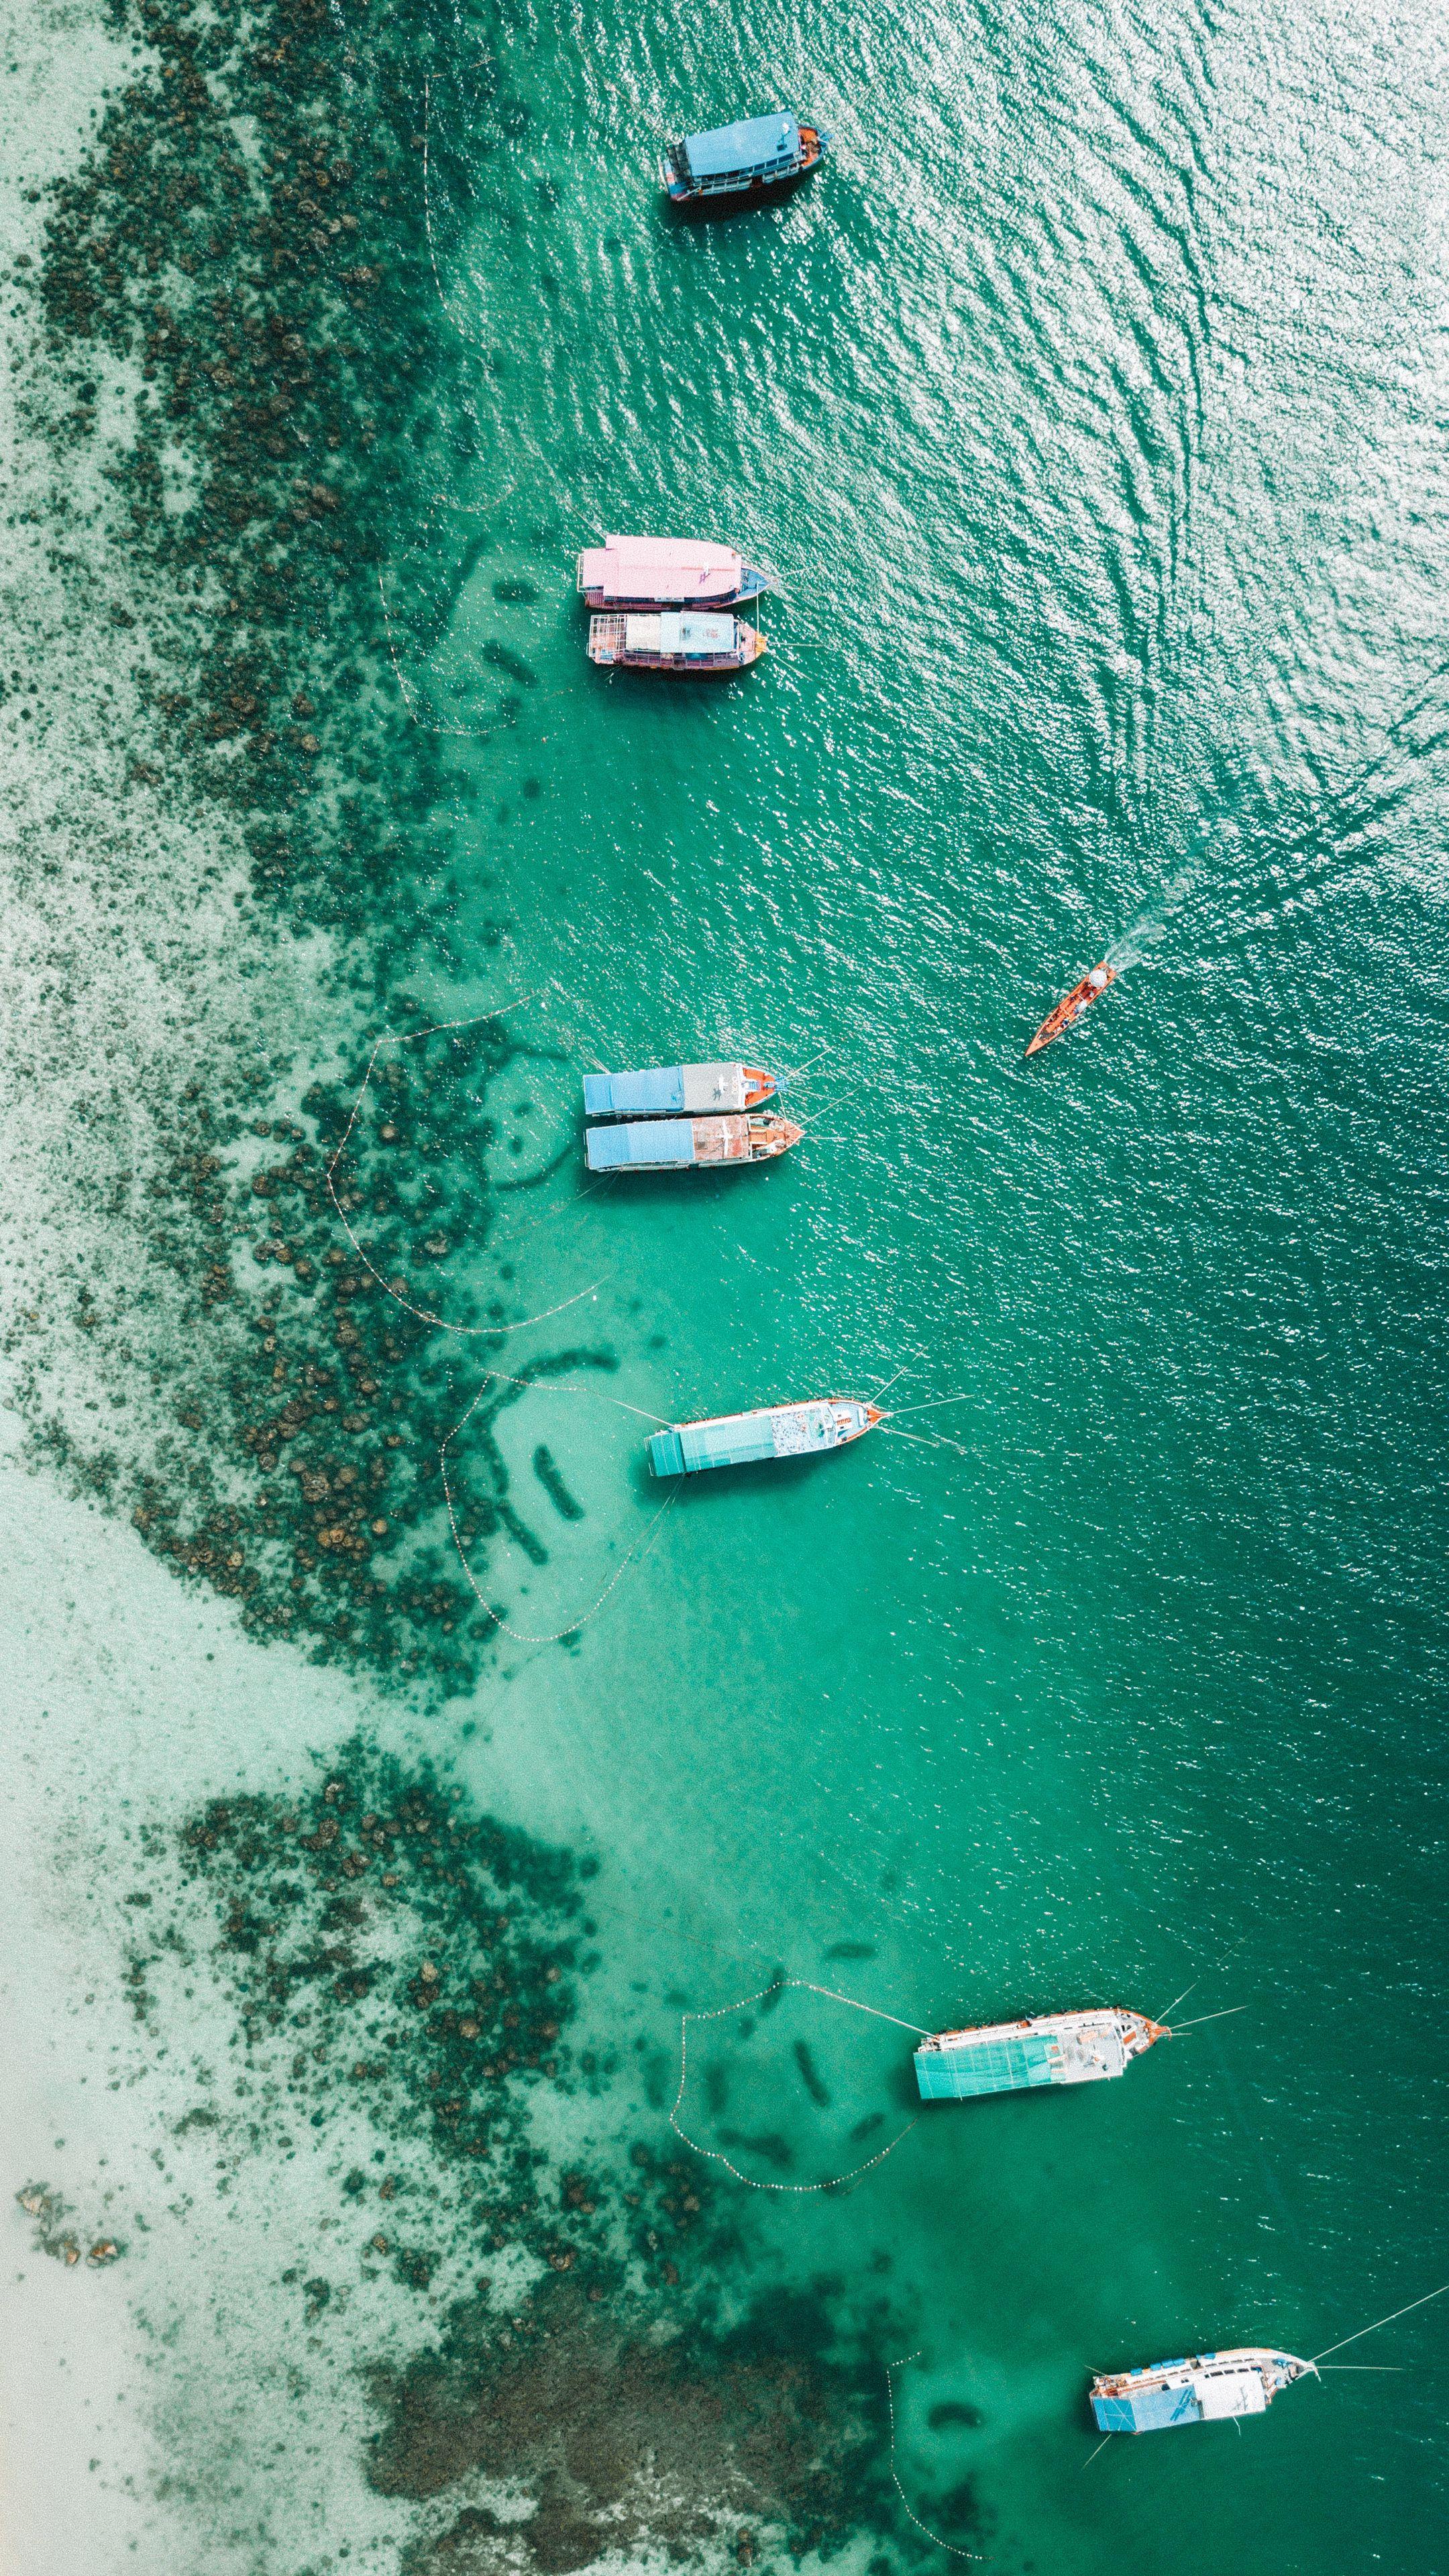 2160x3840 Wallpaper shore, boats, sandbar, ocean, moored, aerial view